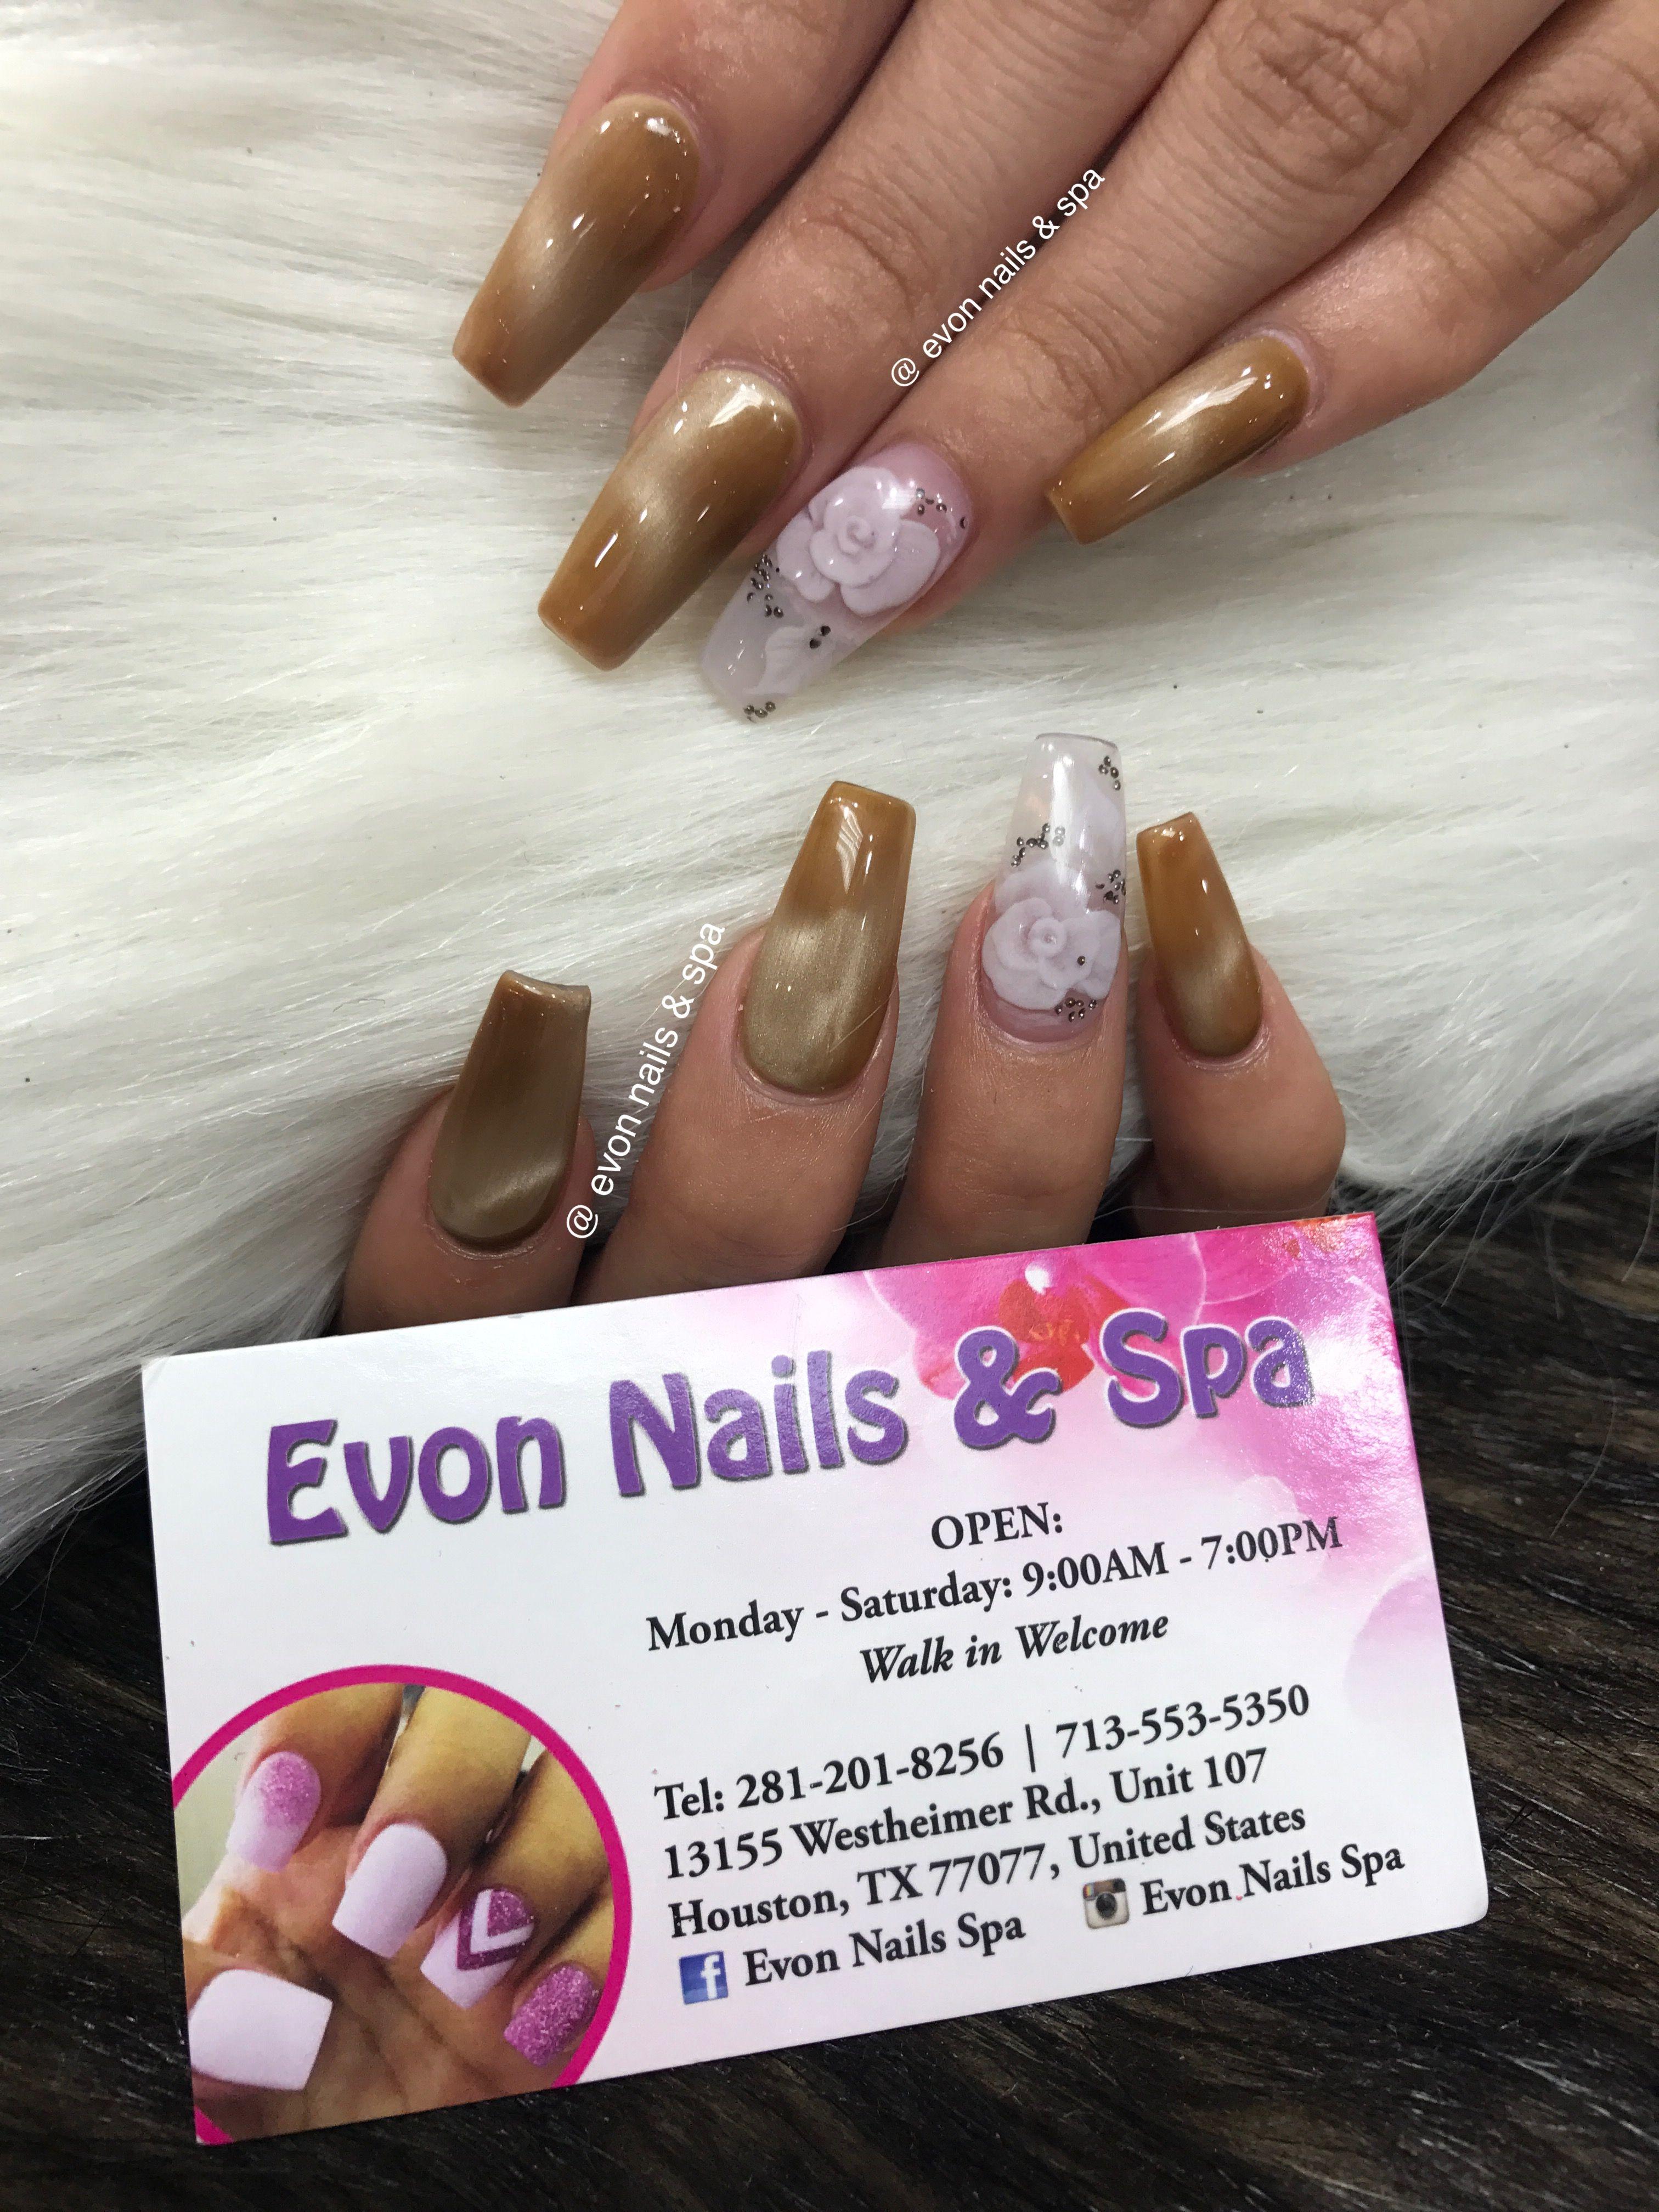 Pin By Evon Nails Spa On Evon Nails Spa Nails Nail Designs